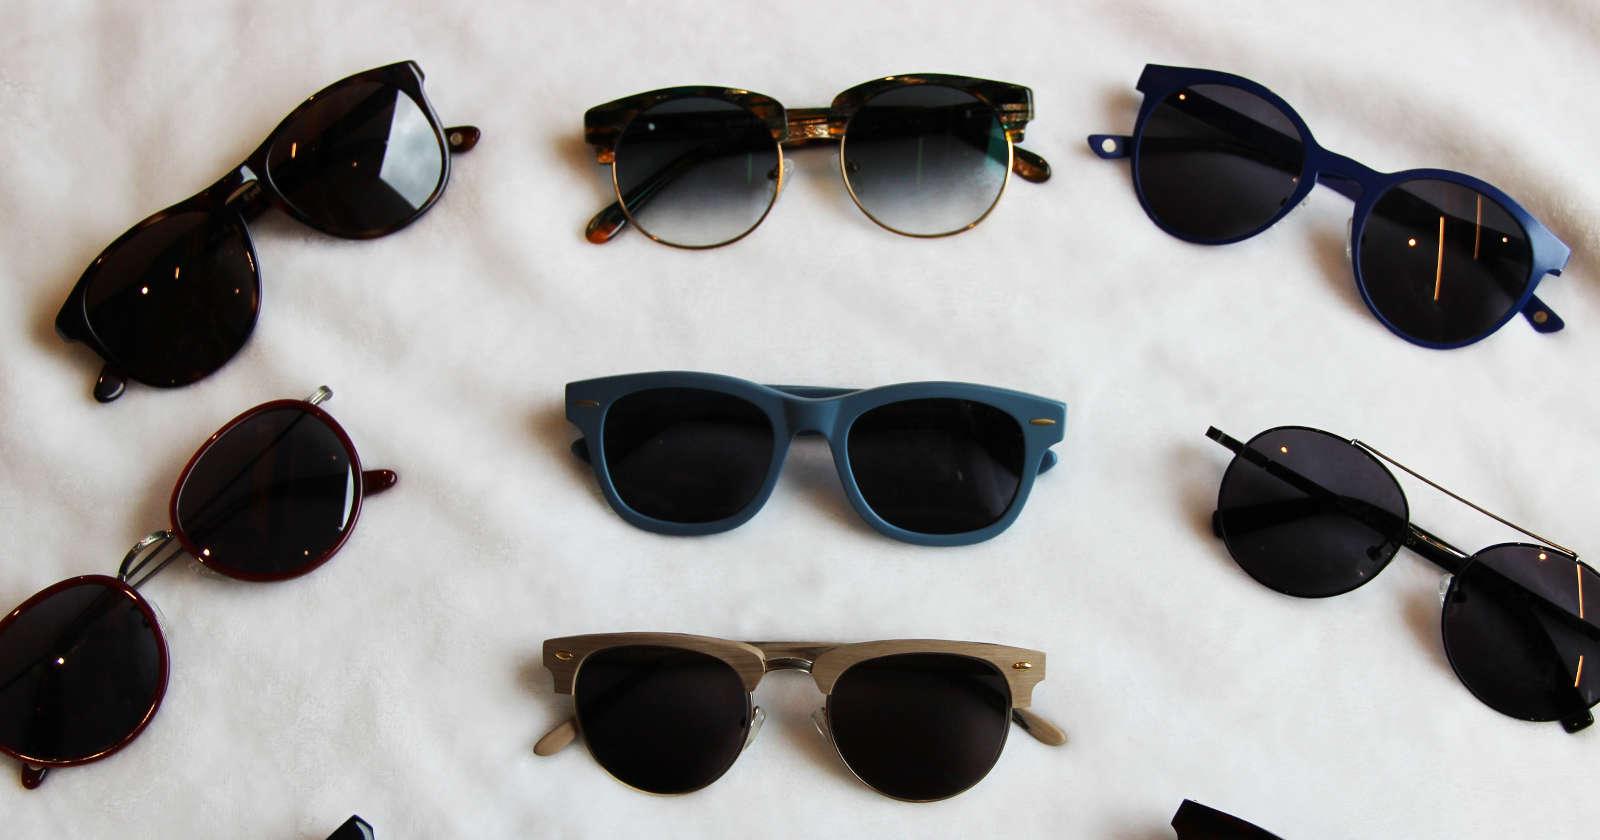 2fa9306eac9a Are Polarized Sunglasses Worth It for You